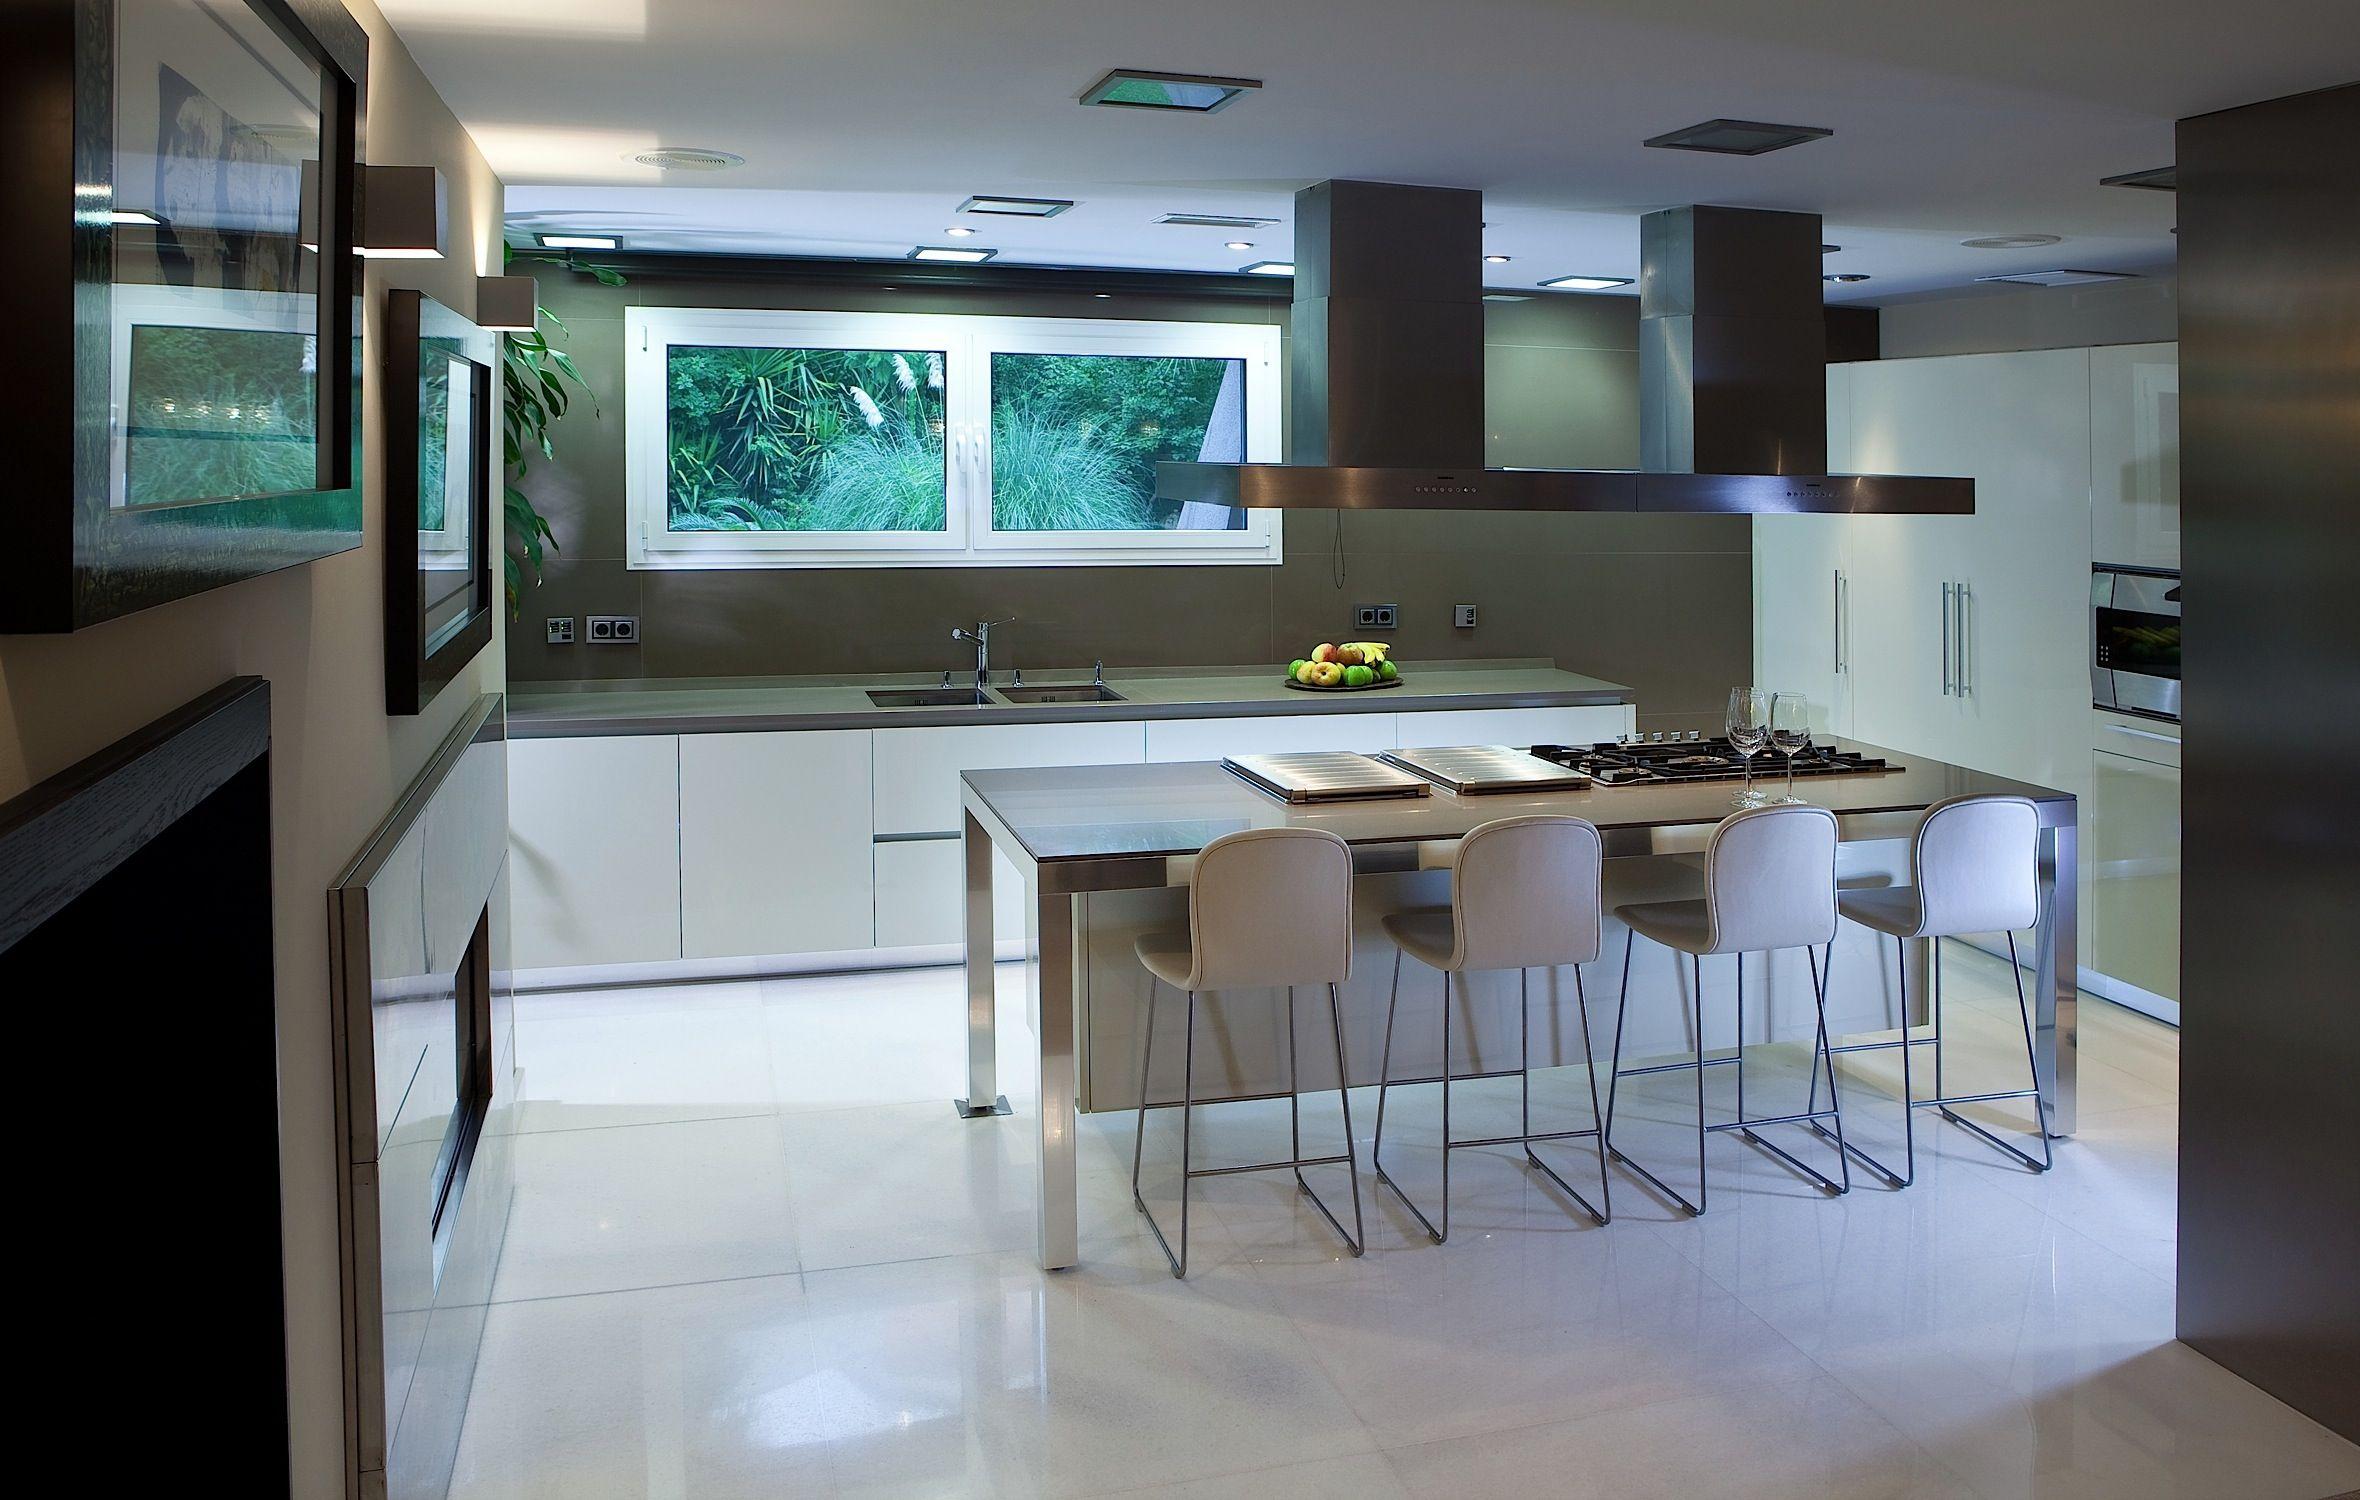 Silestone UNSUI   Kitchen Silestone by Cosentino   Pinterest   Para ...